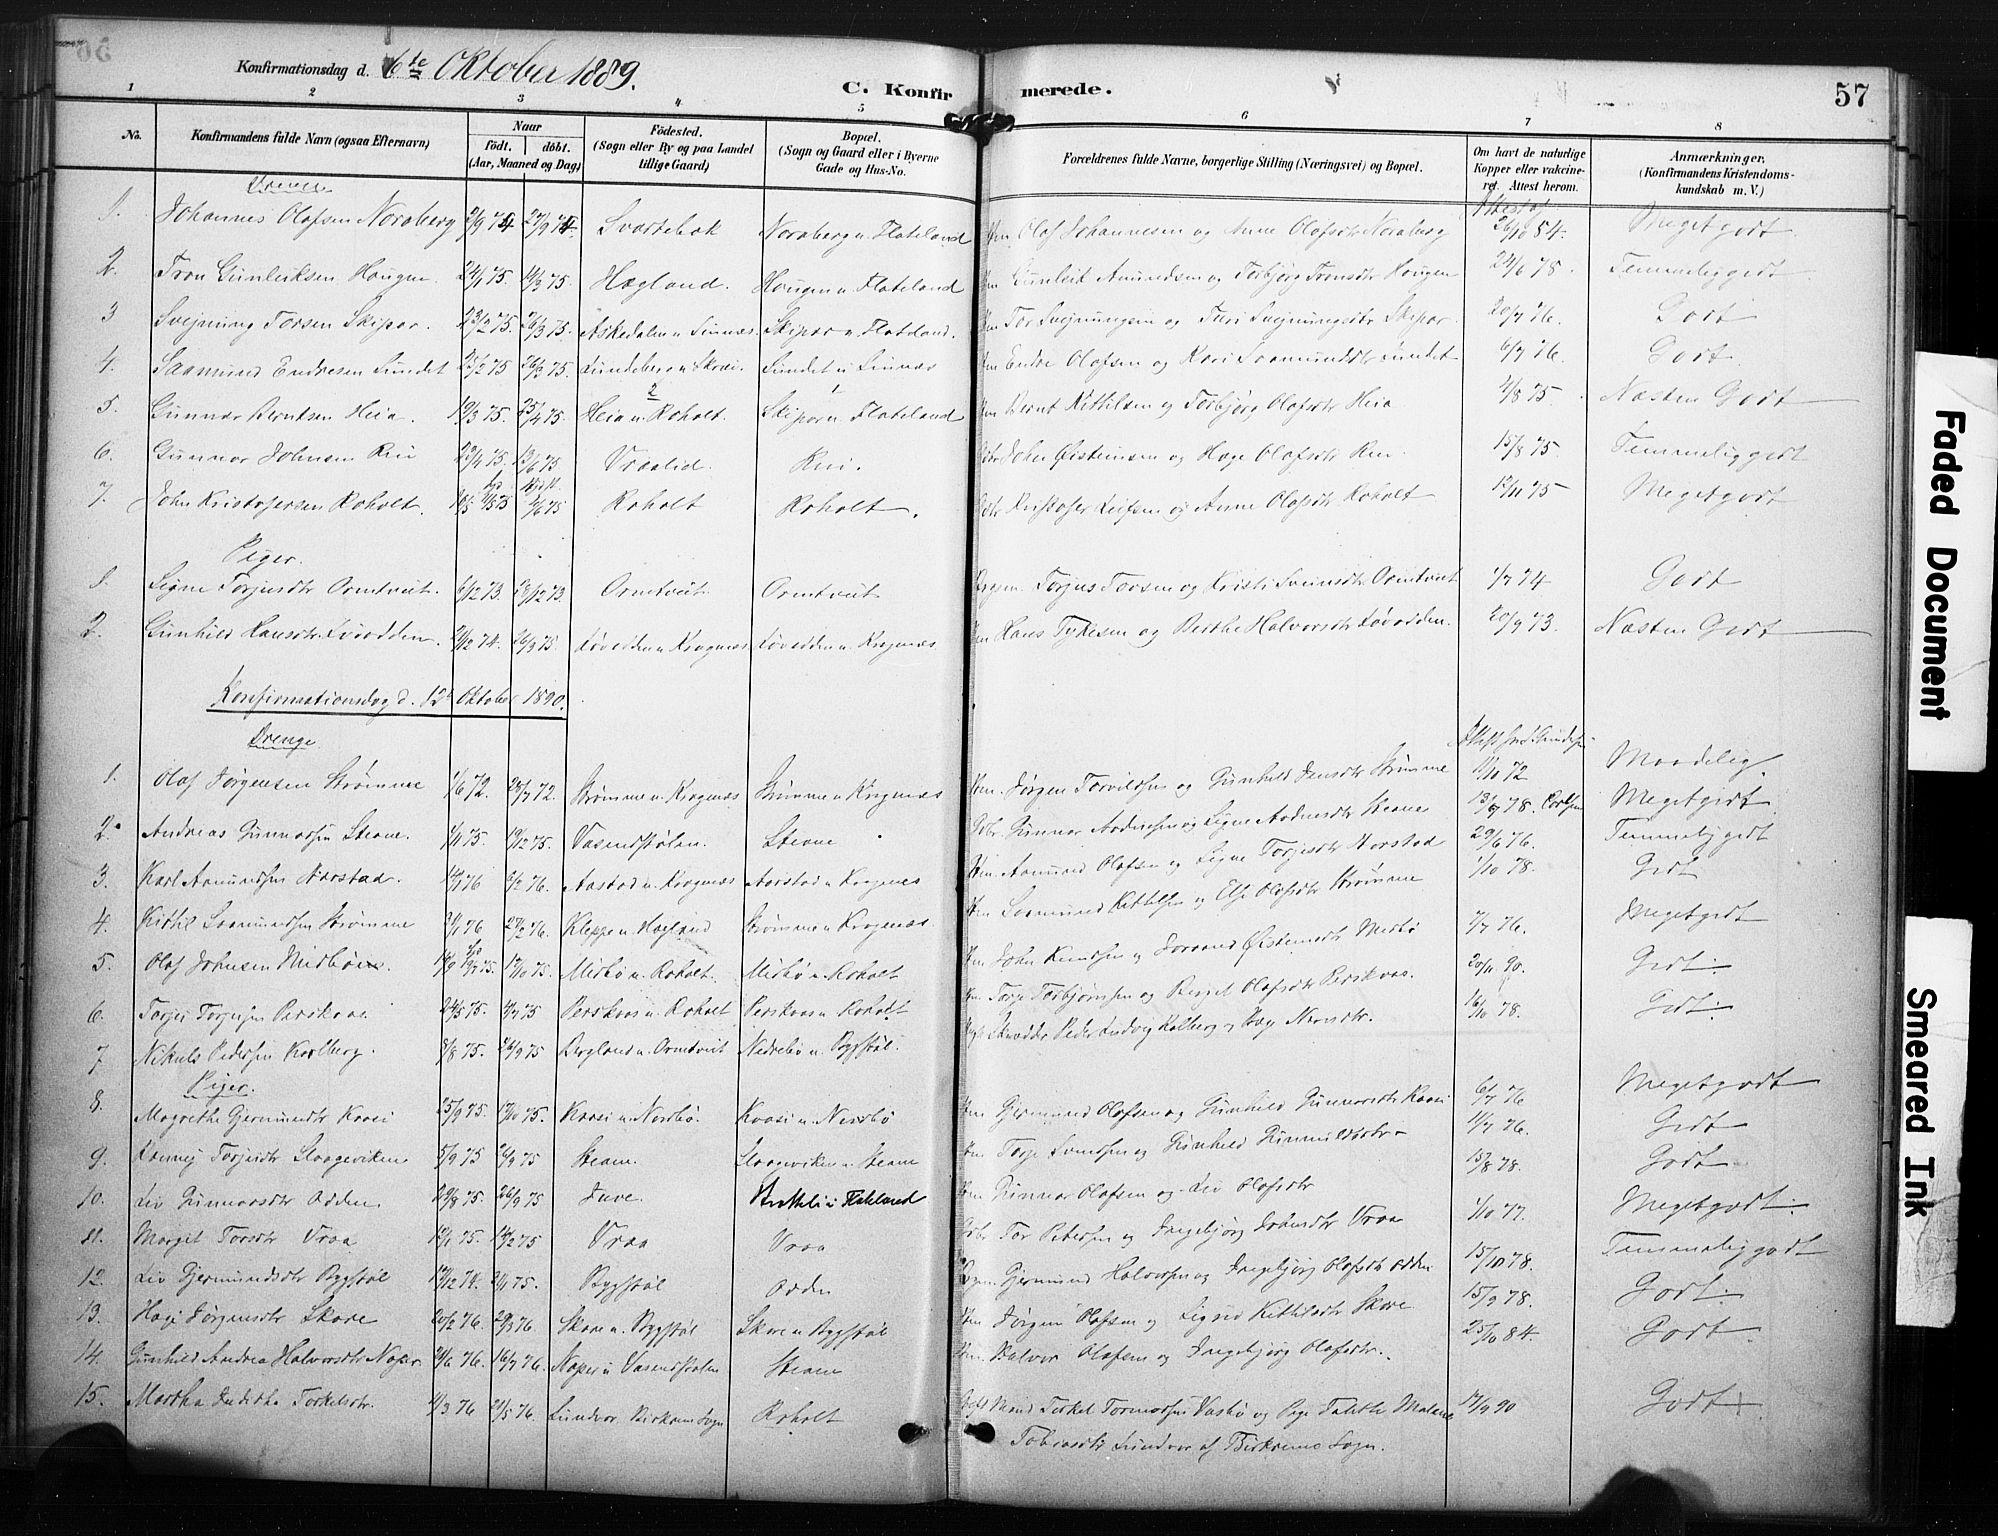 SAKO, Kviteseid kirkebøker, F/Fc/L0002: Ministerialbok nr. III 2, 1882-1908, s. 57